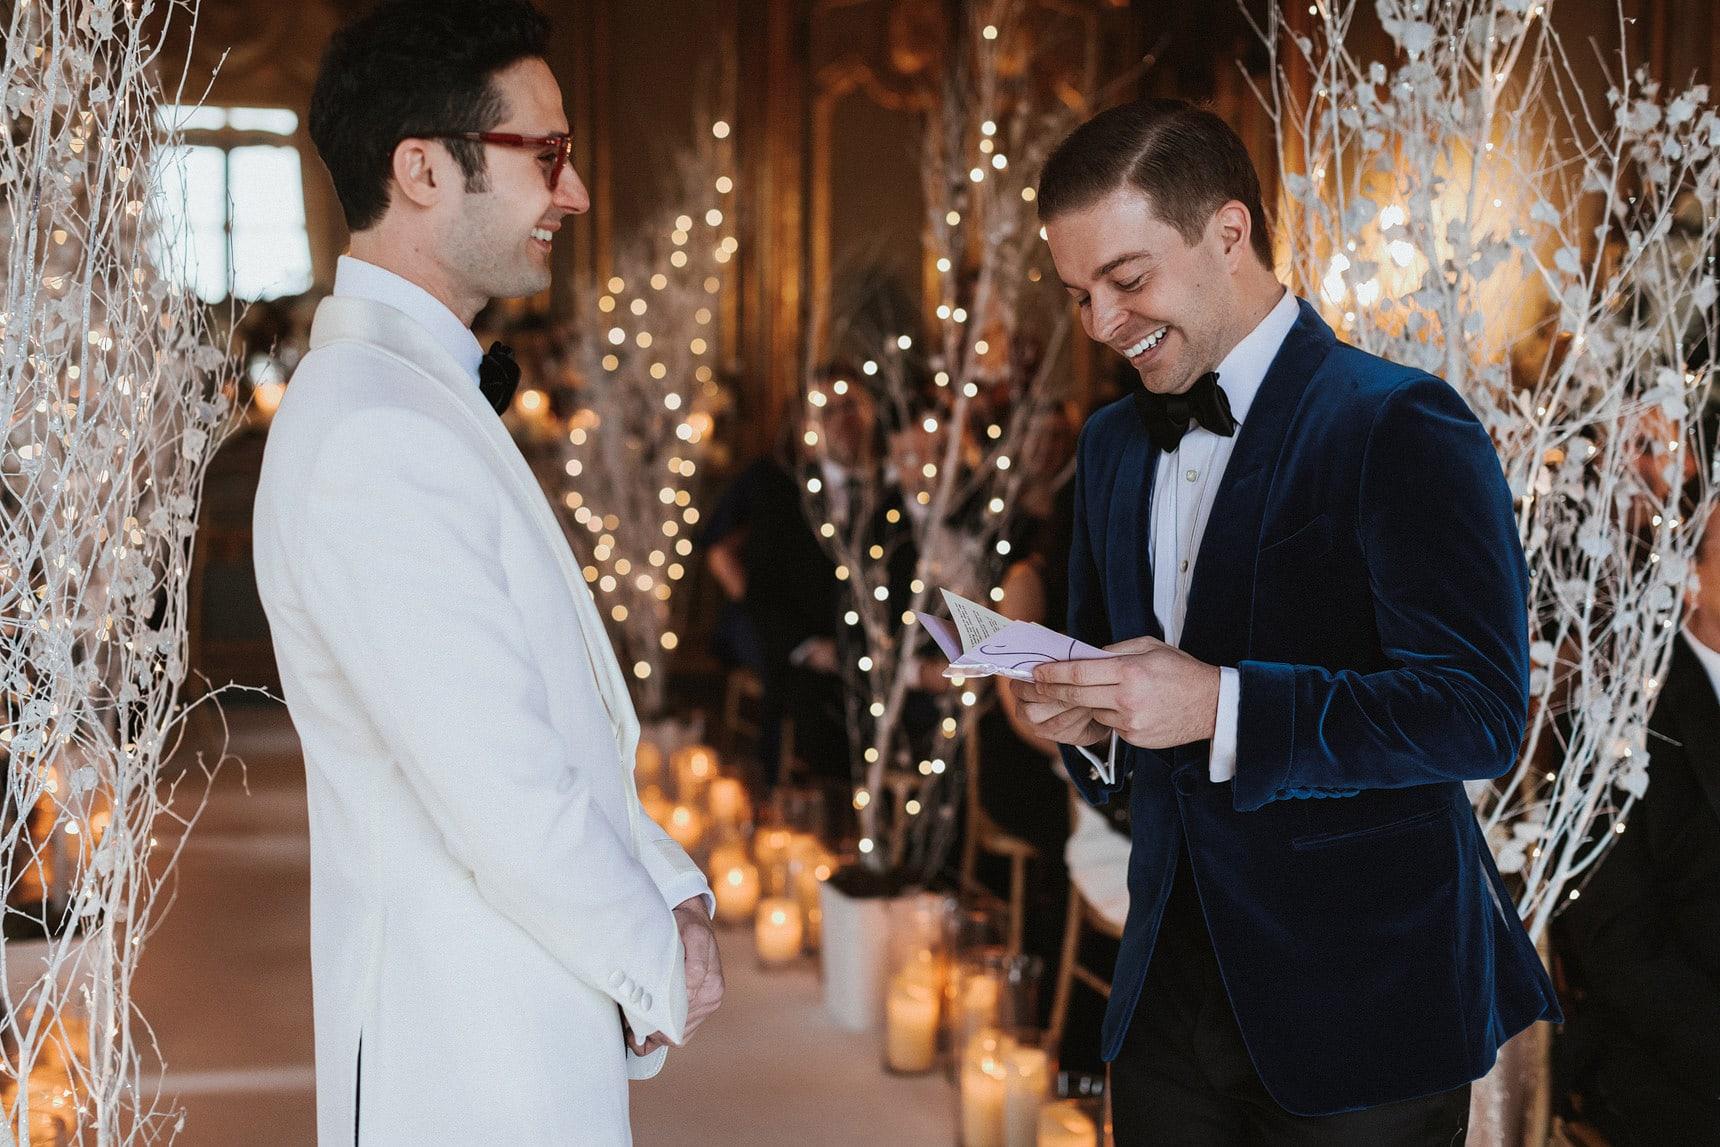 wedding location ideas uk